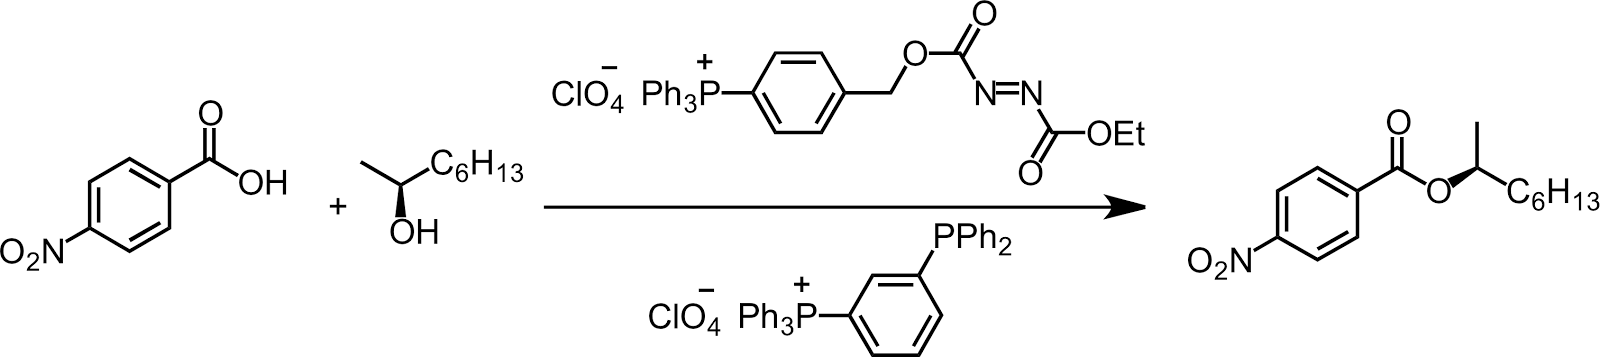 ring opening methathesis Intro to cross metathesis • three main variations – a) cross-metathesis (only  address) – b) ring-opening cross-metathesis – c) intermolecular enyne.